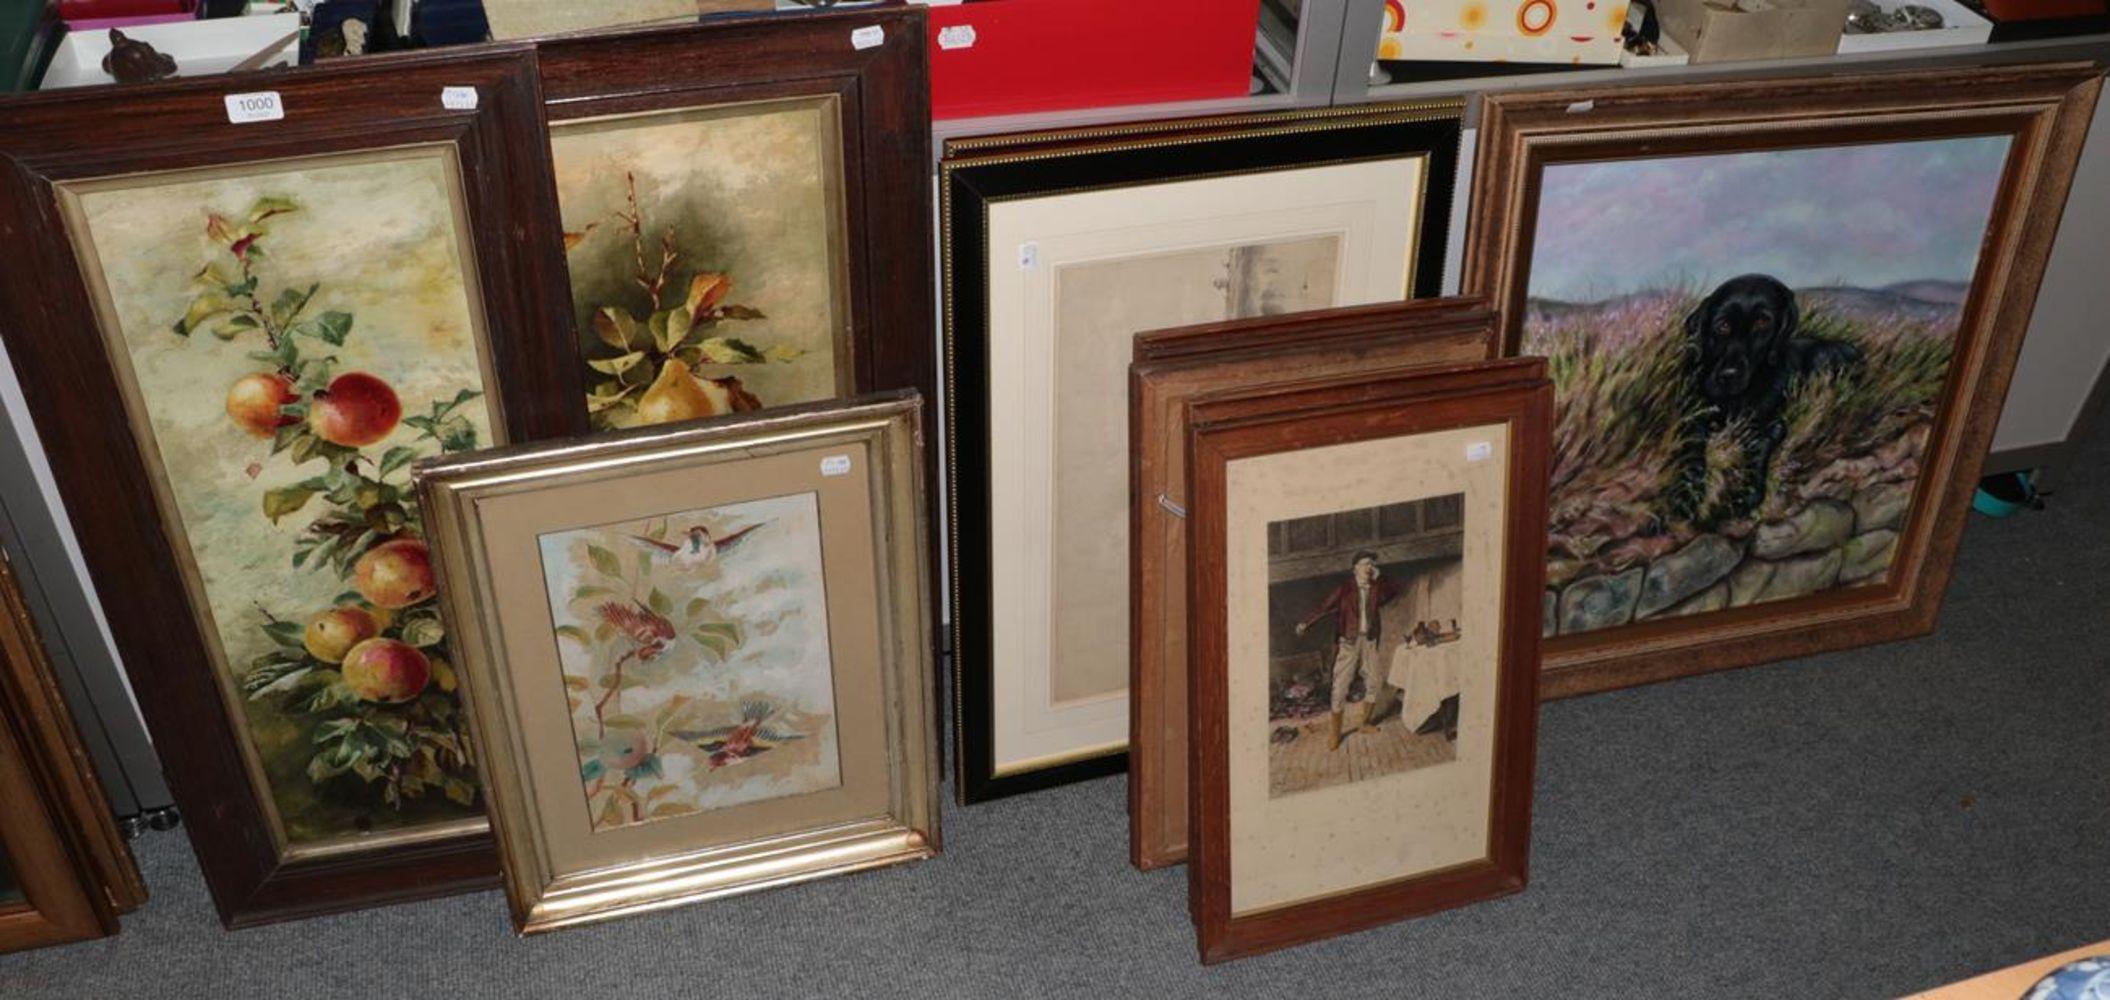 Antiques & Interiors Sale - Part II